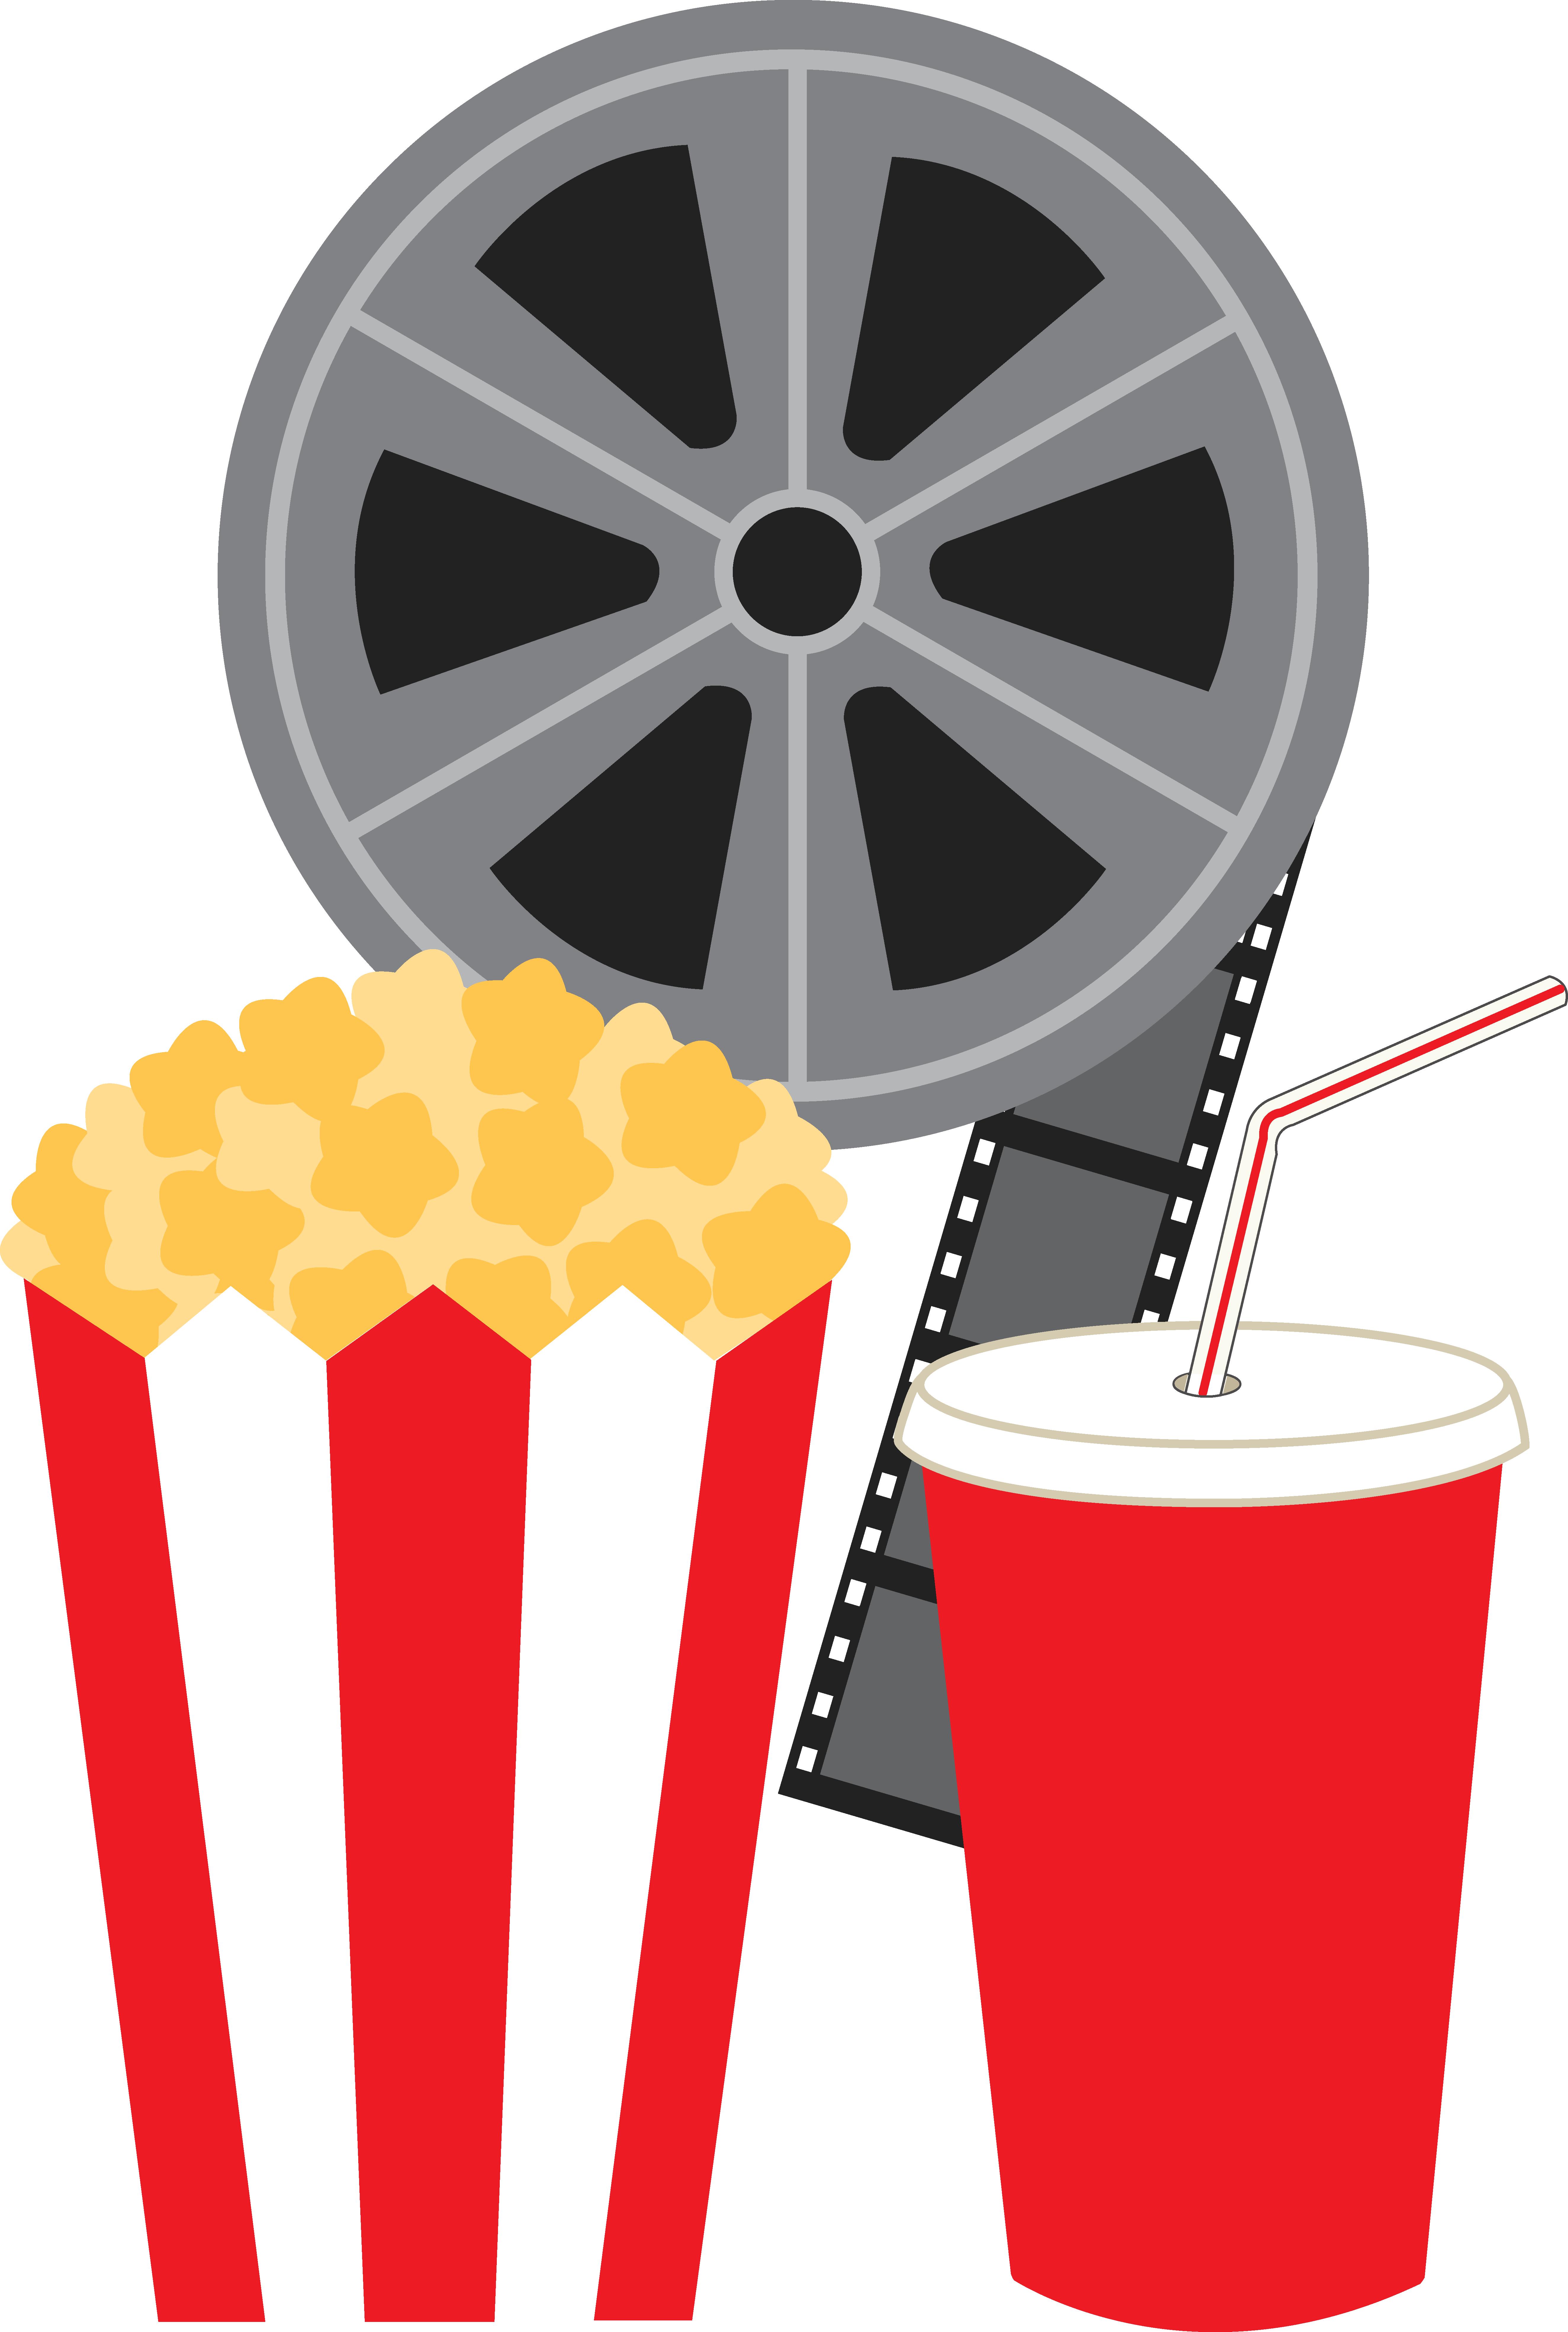 Popcorn Kernel Border | Clipart Panda - Free Clipart Images